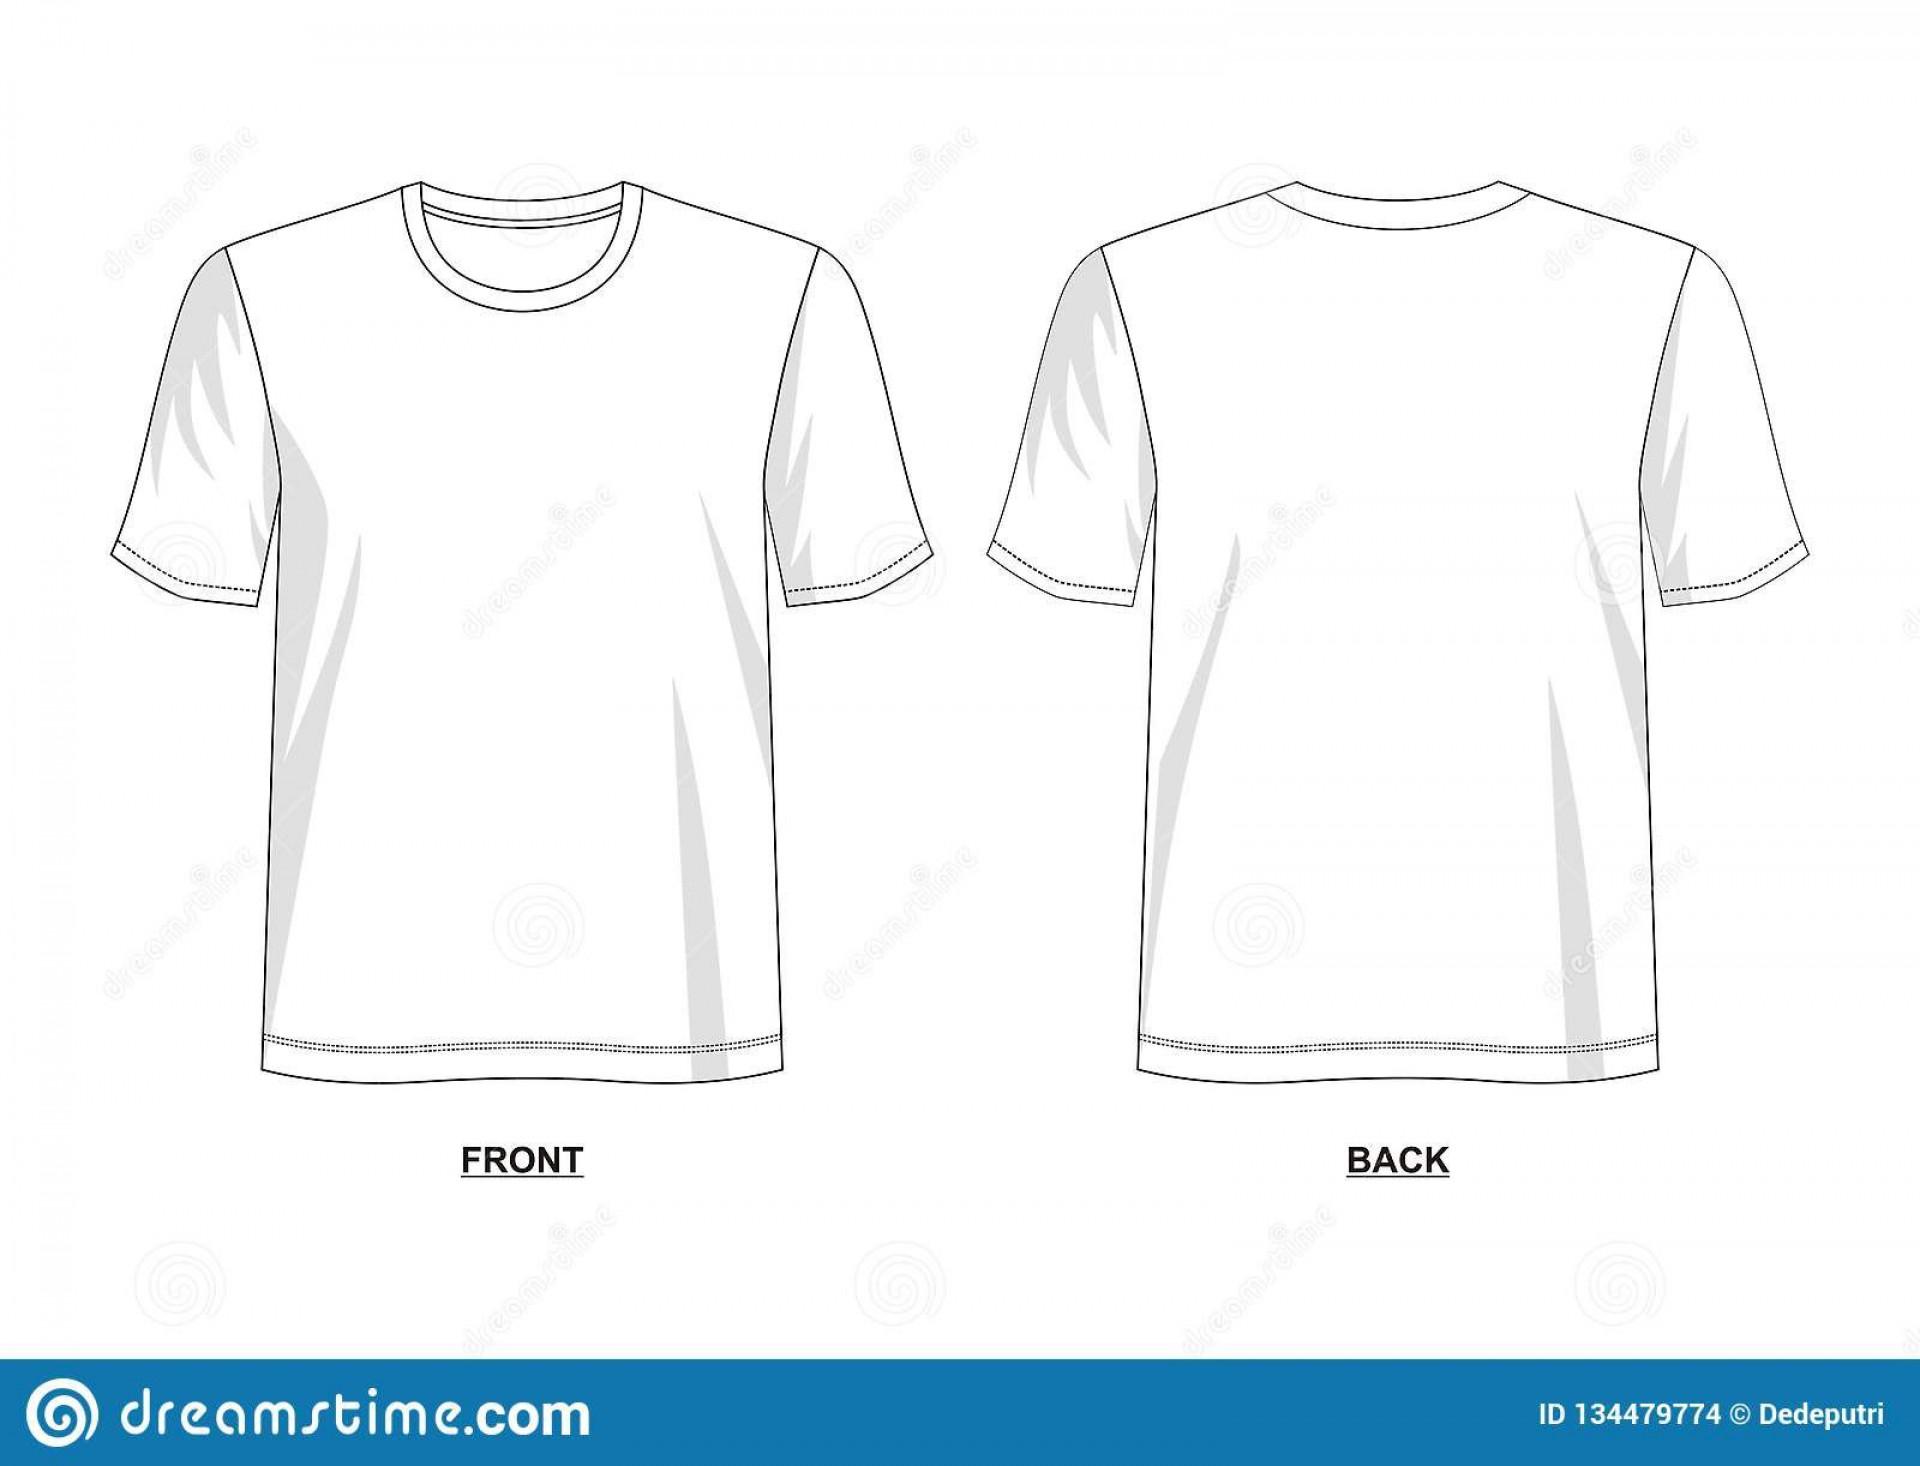 009 Shocking T Shirt Template Design High Def  Psd Free Download Editable1920